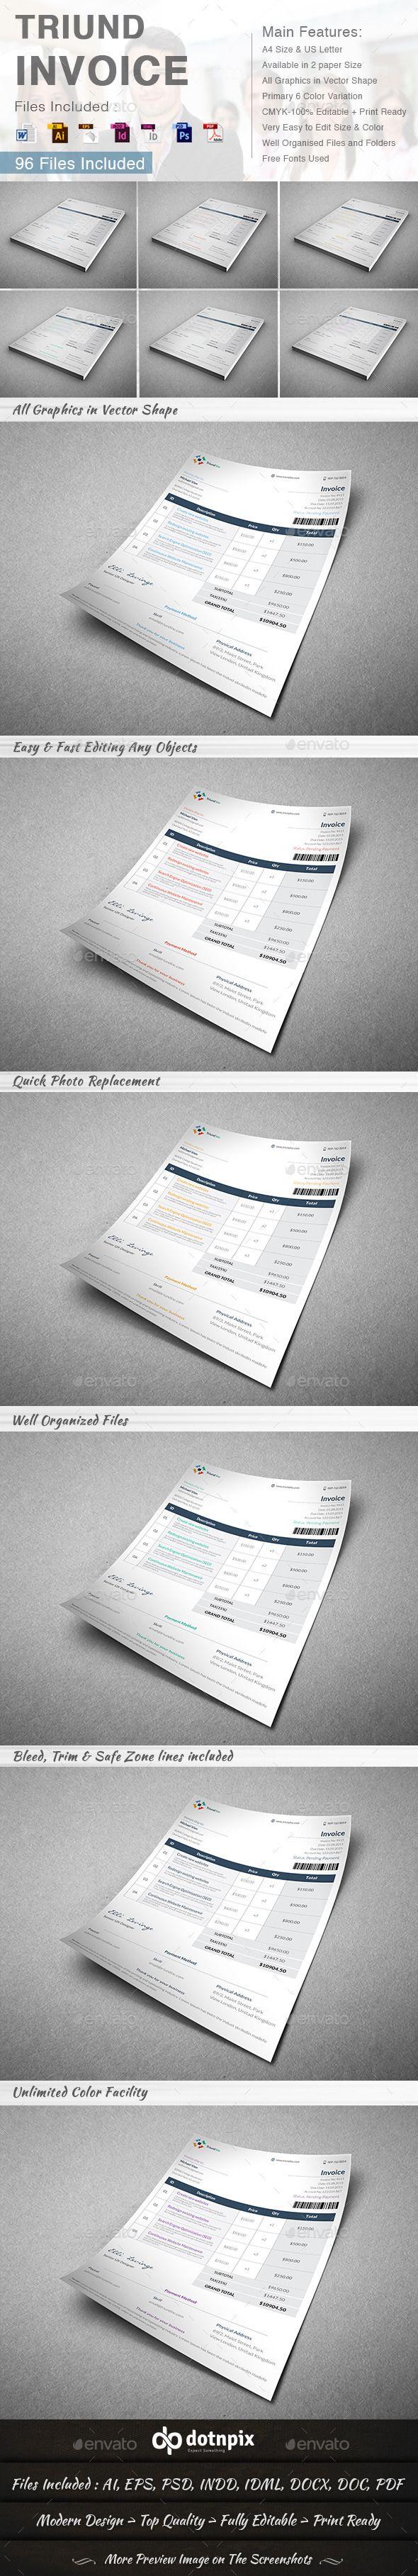 free proposal template%0A Triund Invoice  Invoice DesignInvoice TemplateProposal